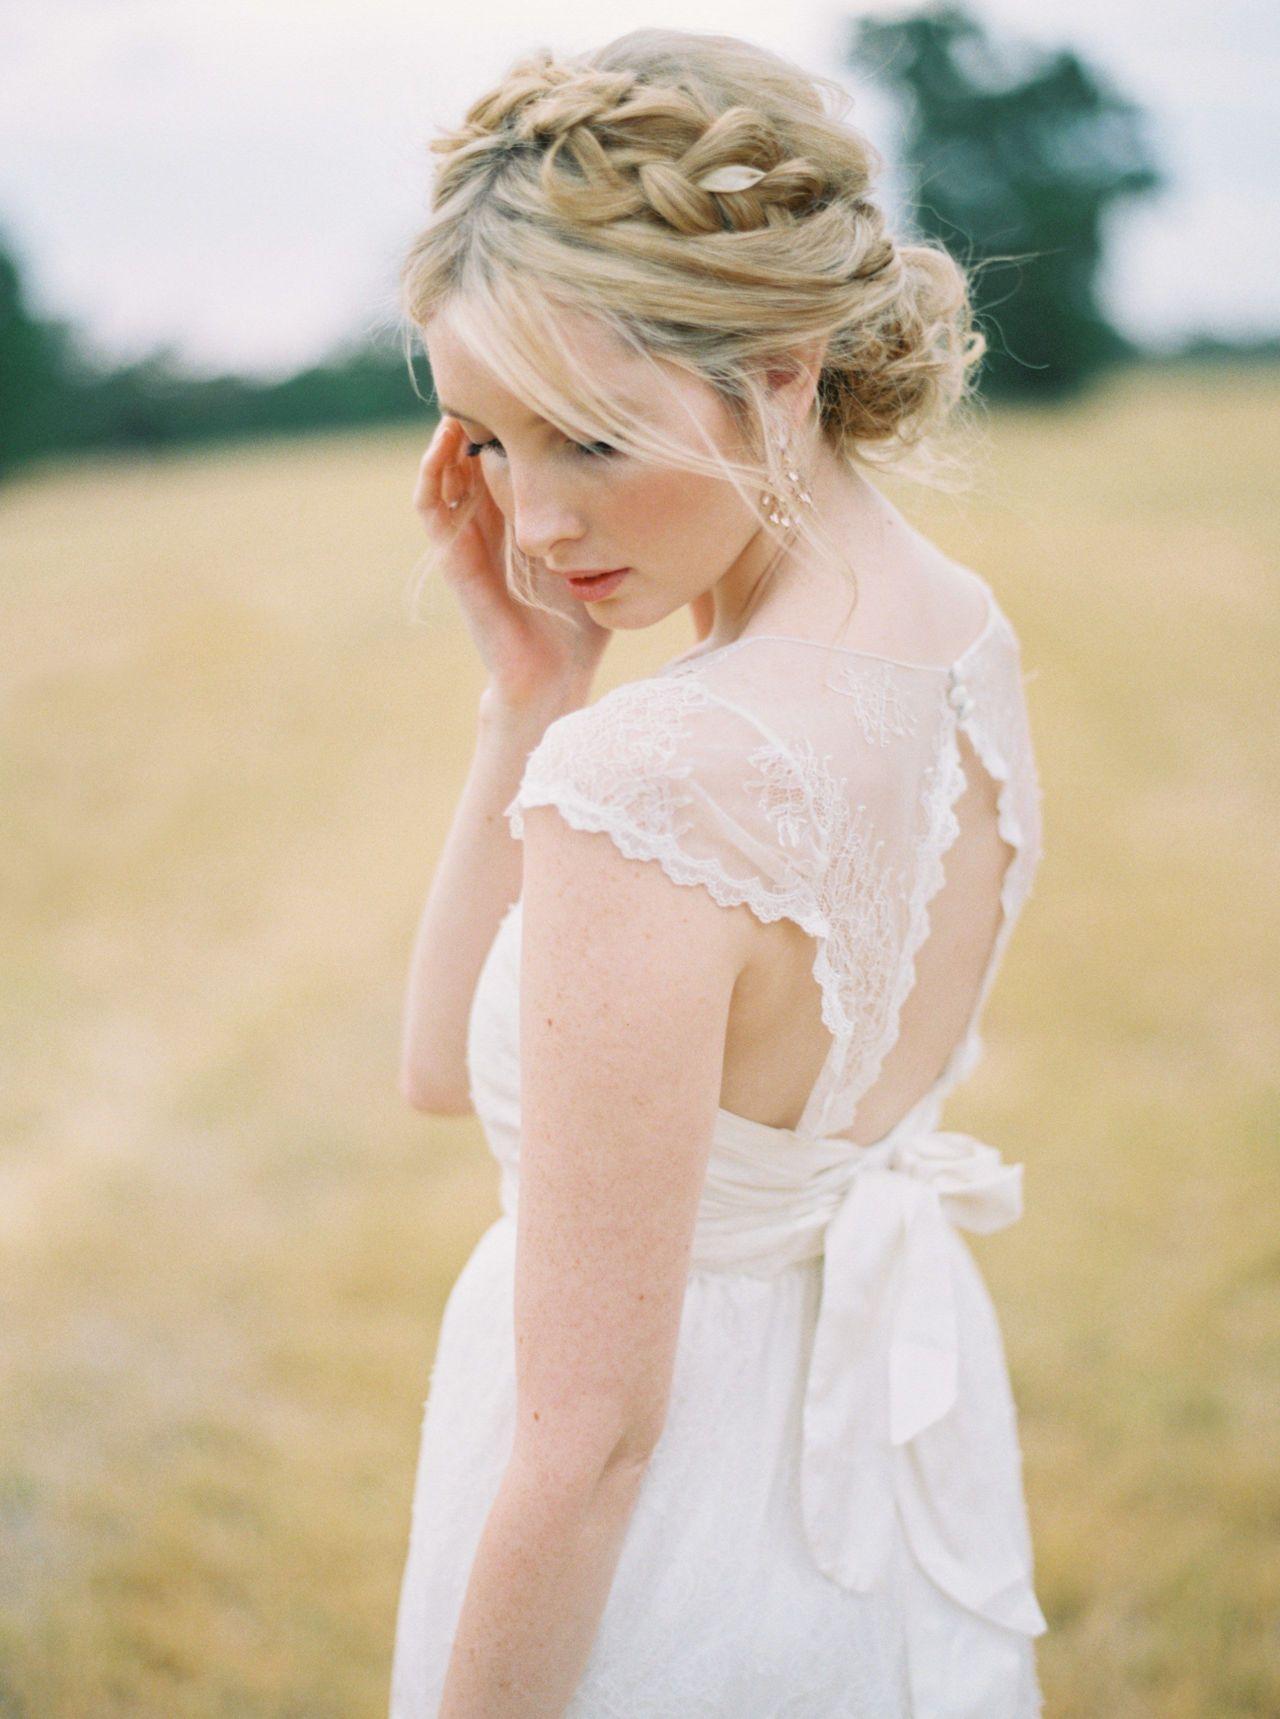 9 free-spirited ways to be a gorgeous bohemian bride   weddings